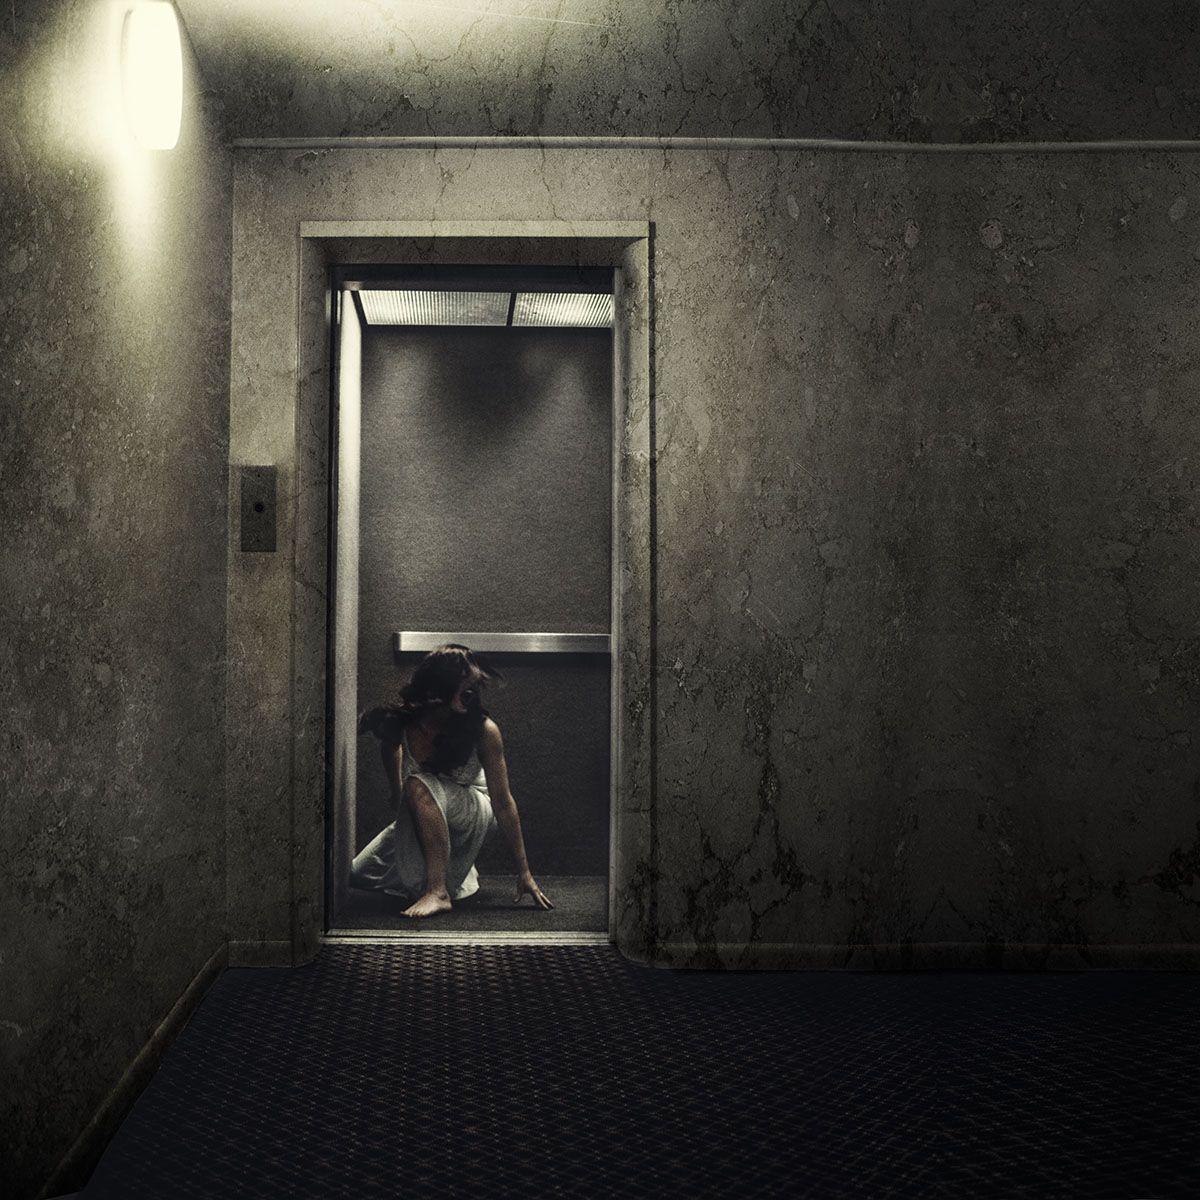 Creepy Image By Heather Byington Would Make A Cool Elevator Scene